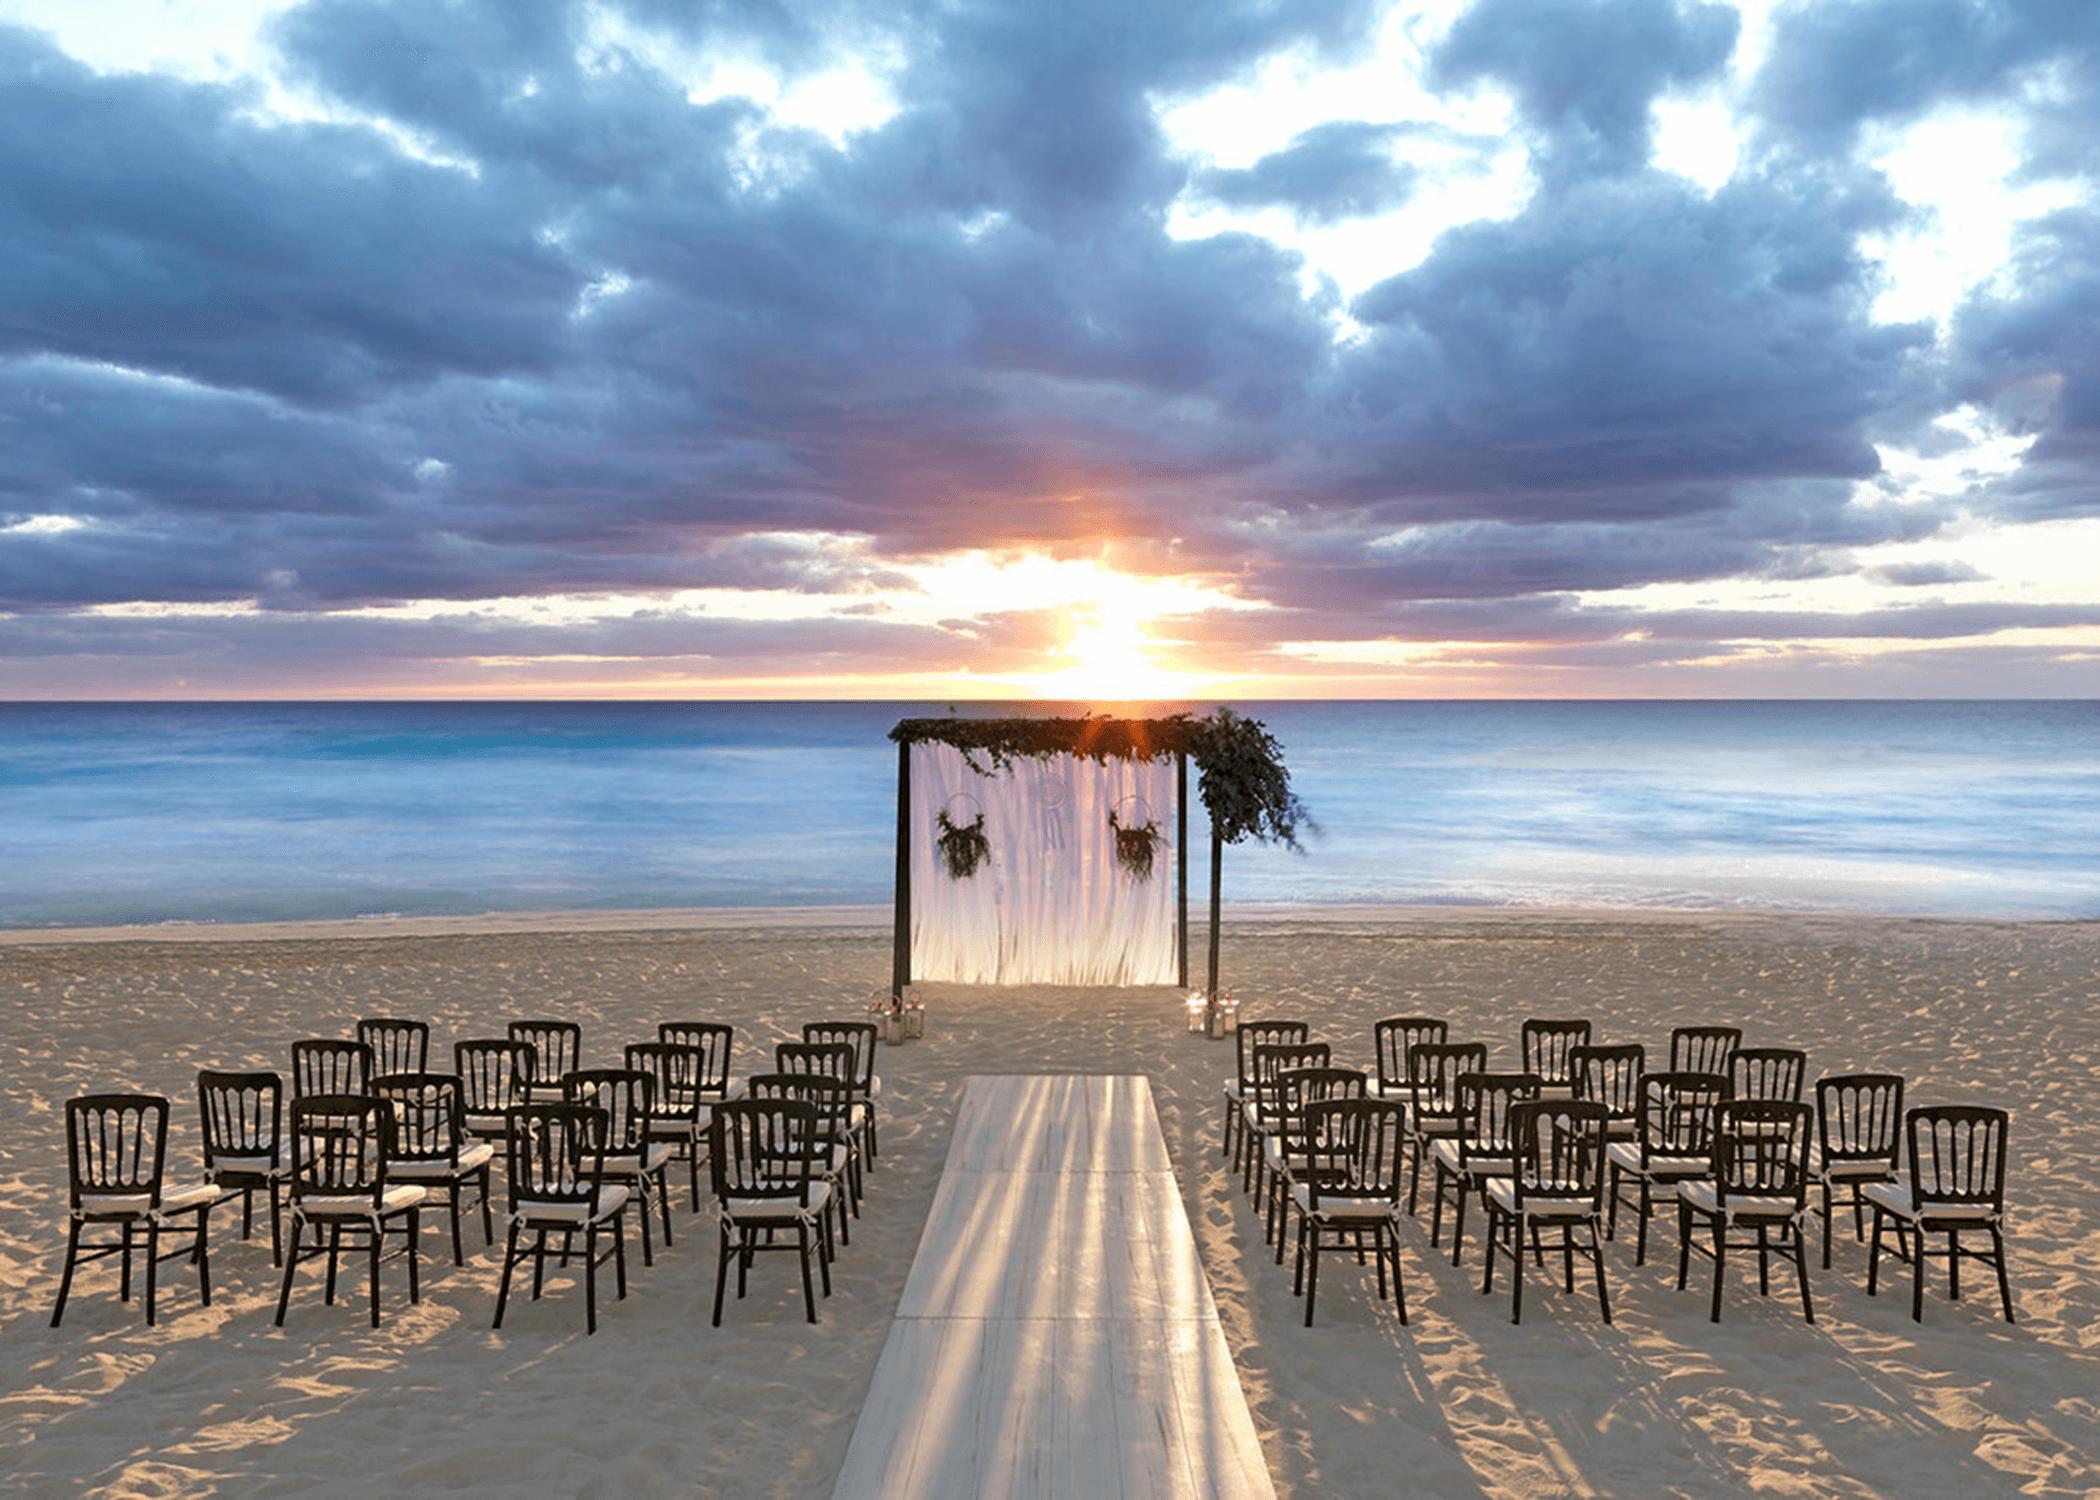 Idea by Bliss Honeymoons and Destinati on Unico Hotel